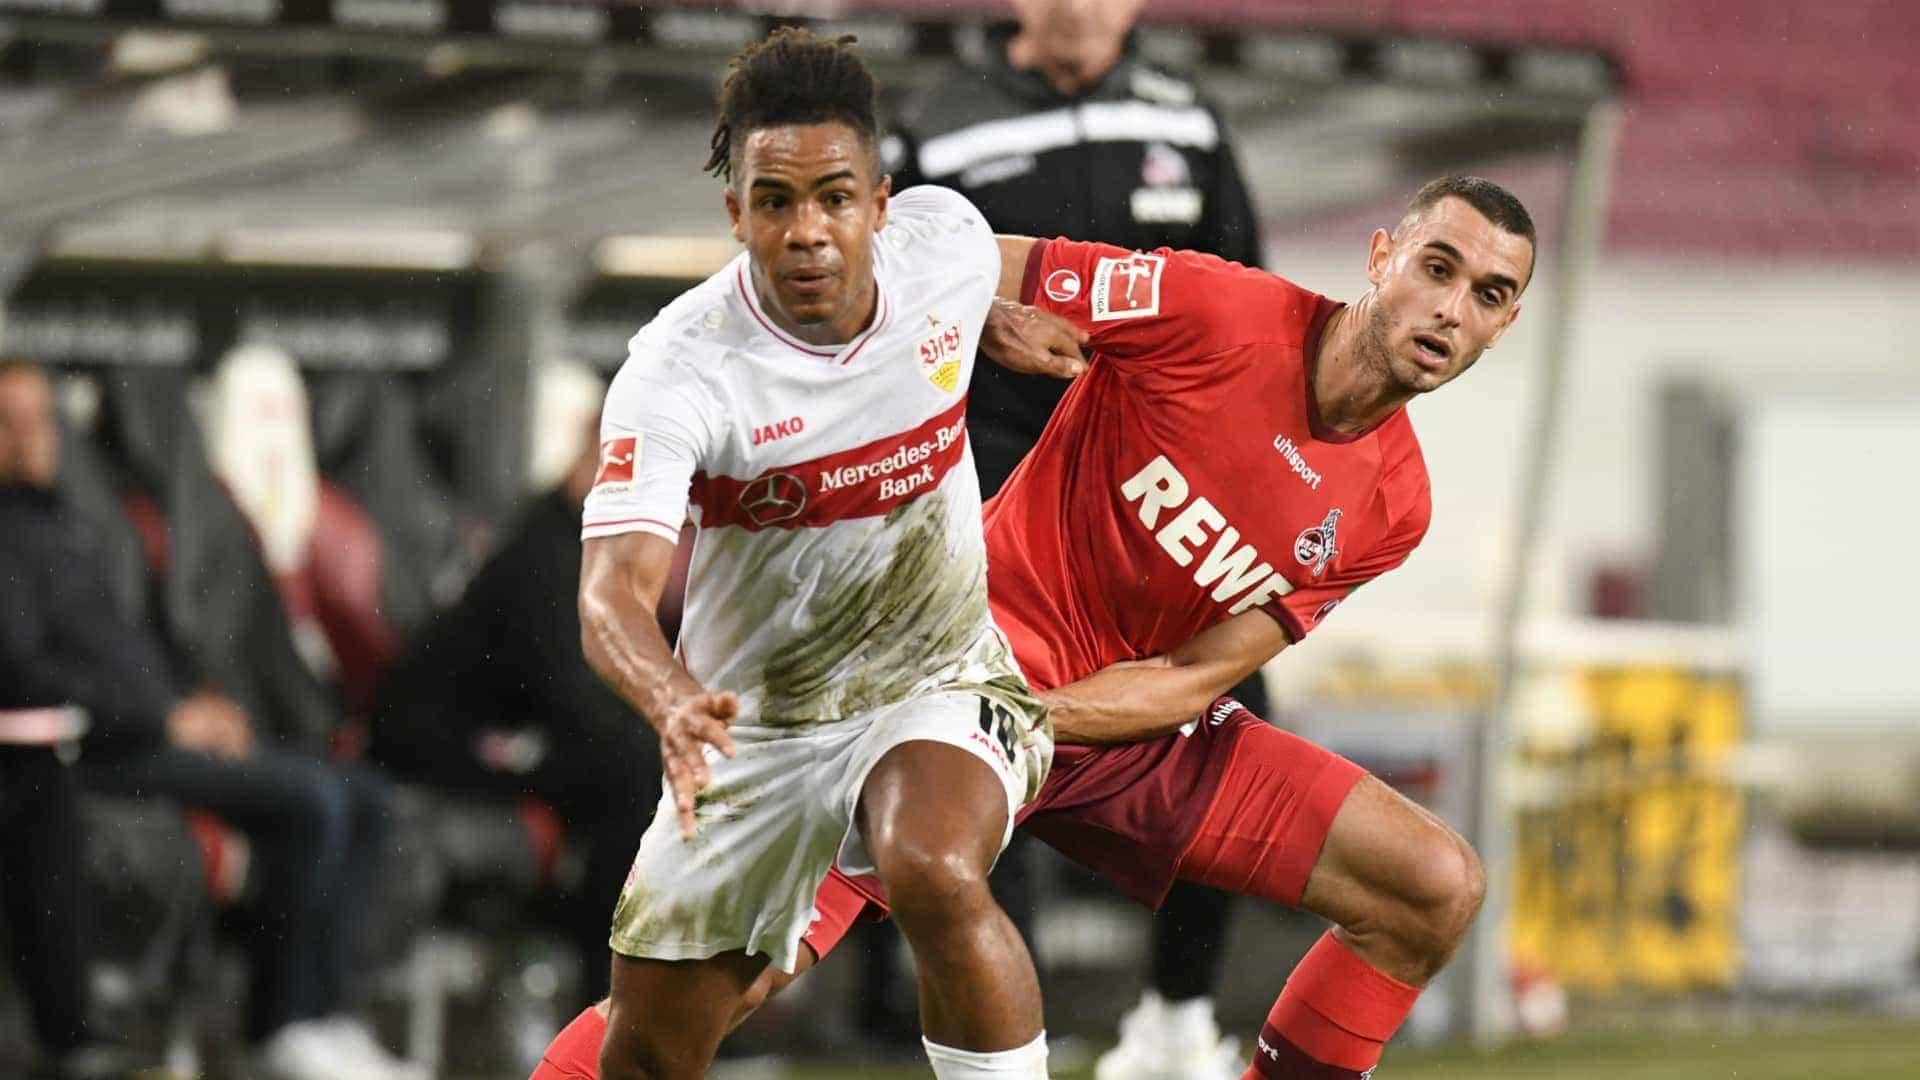 Schalke 04-Stoccarda